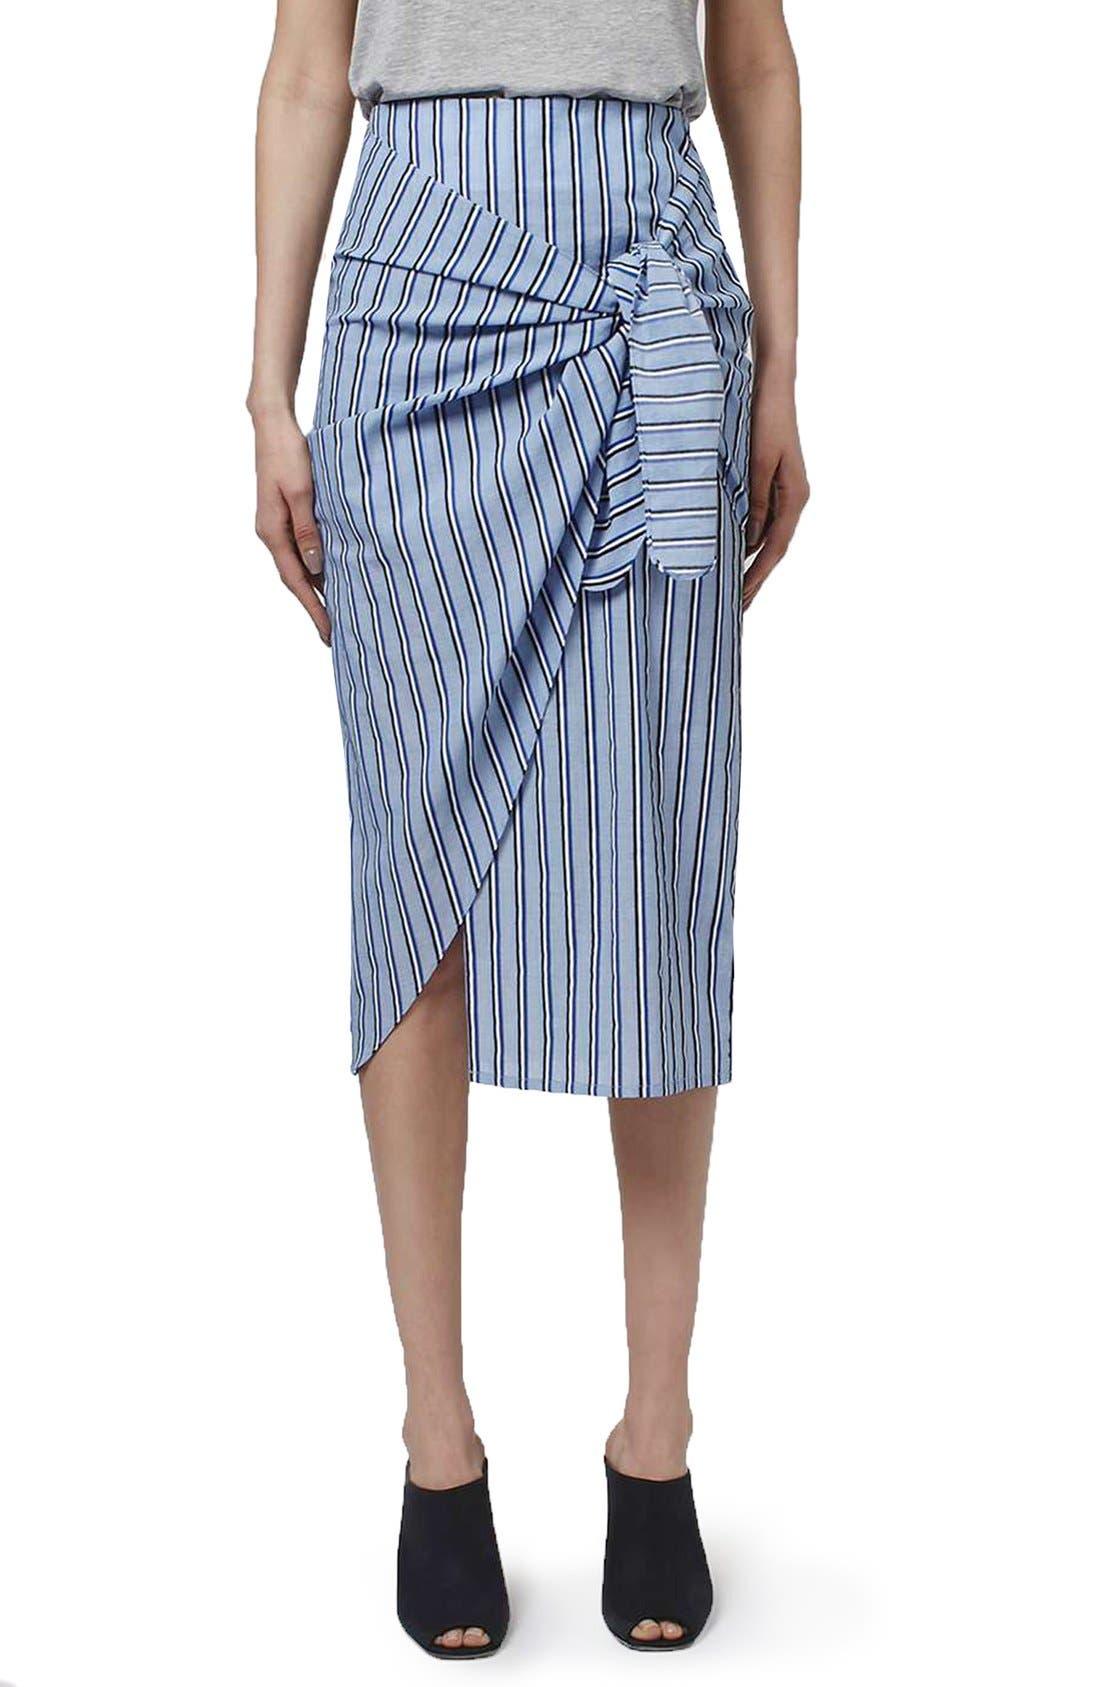 Alternate Image 1 Selected - Topshop Boutique Stripe Faux Wrap Skirt